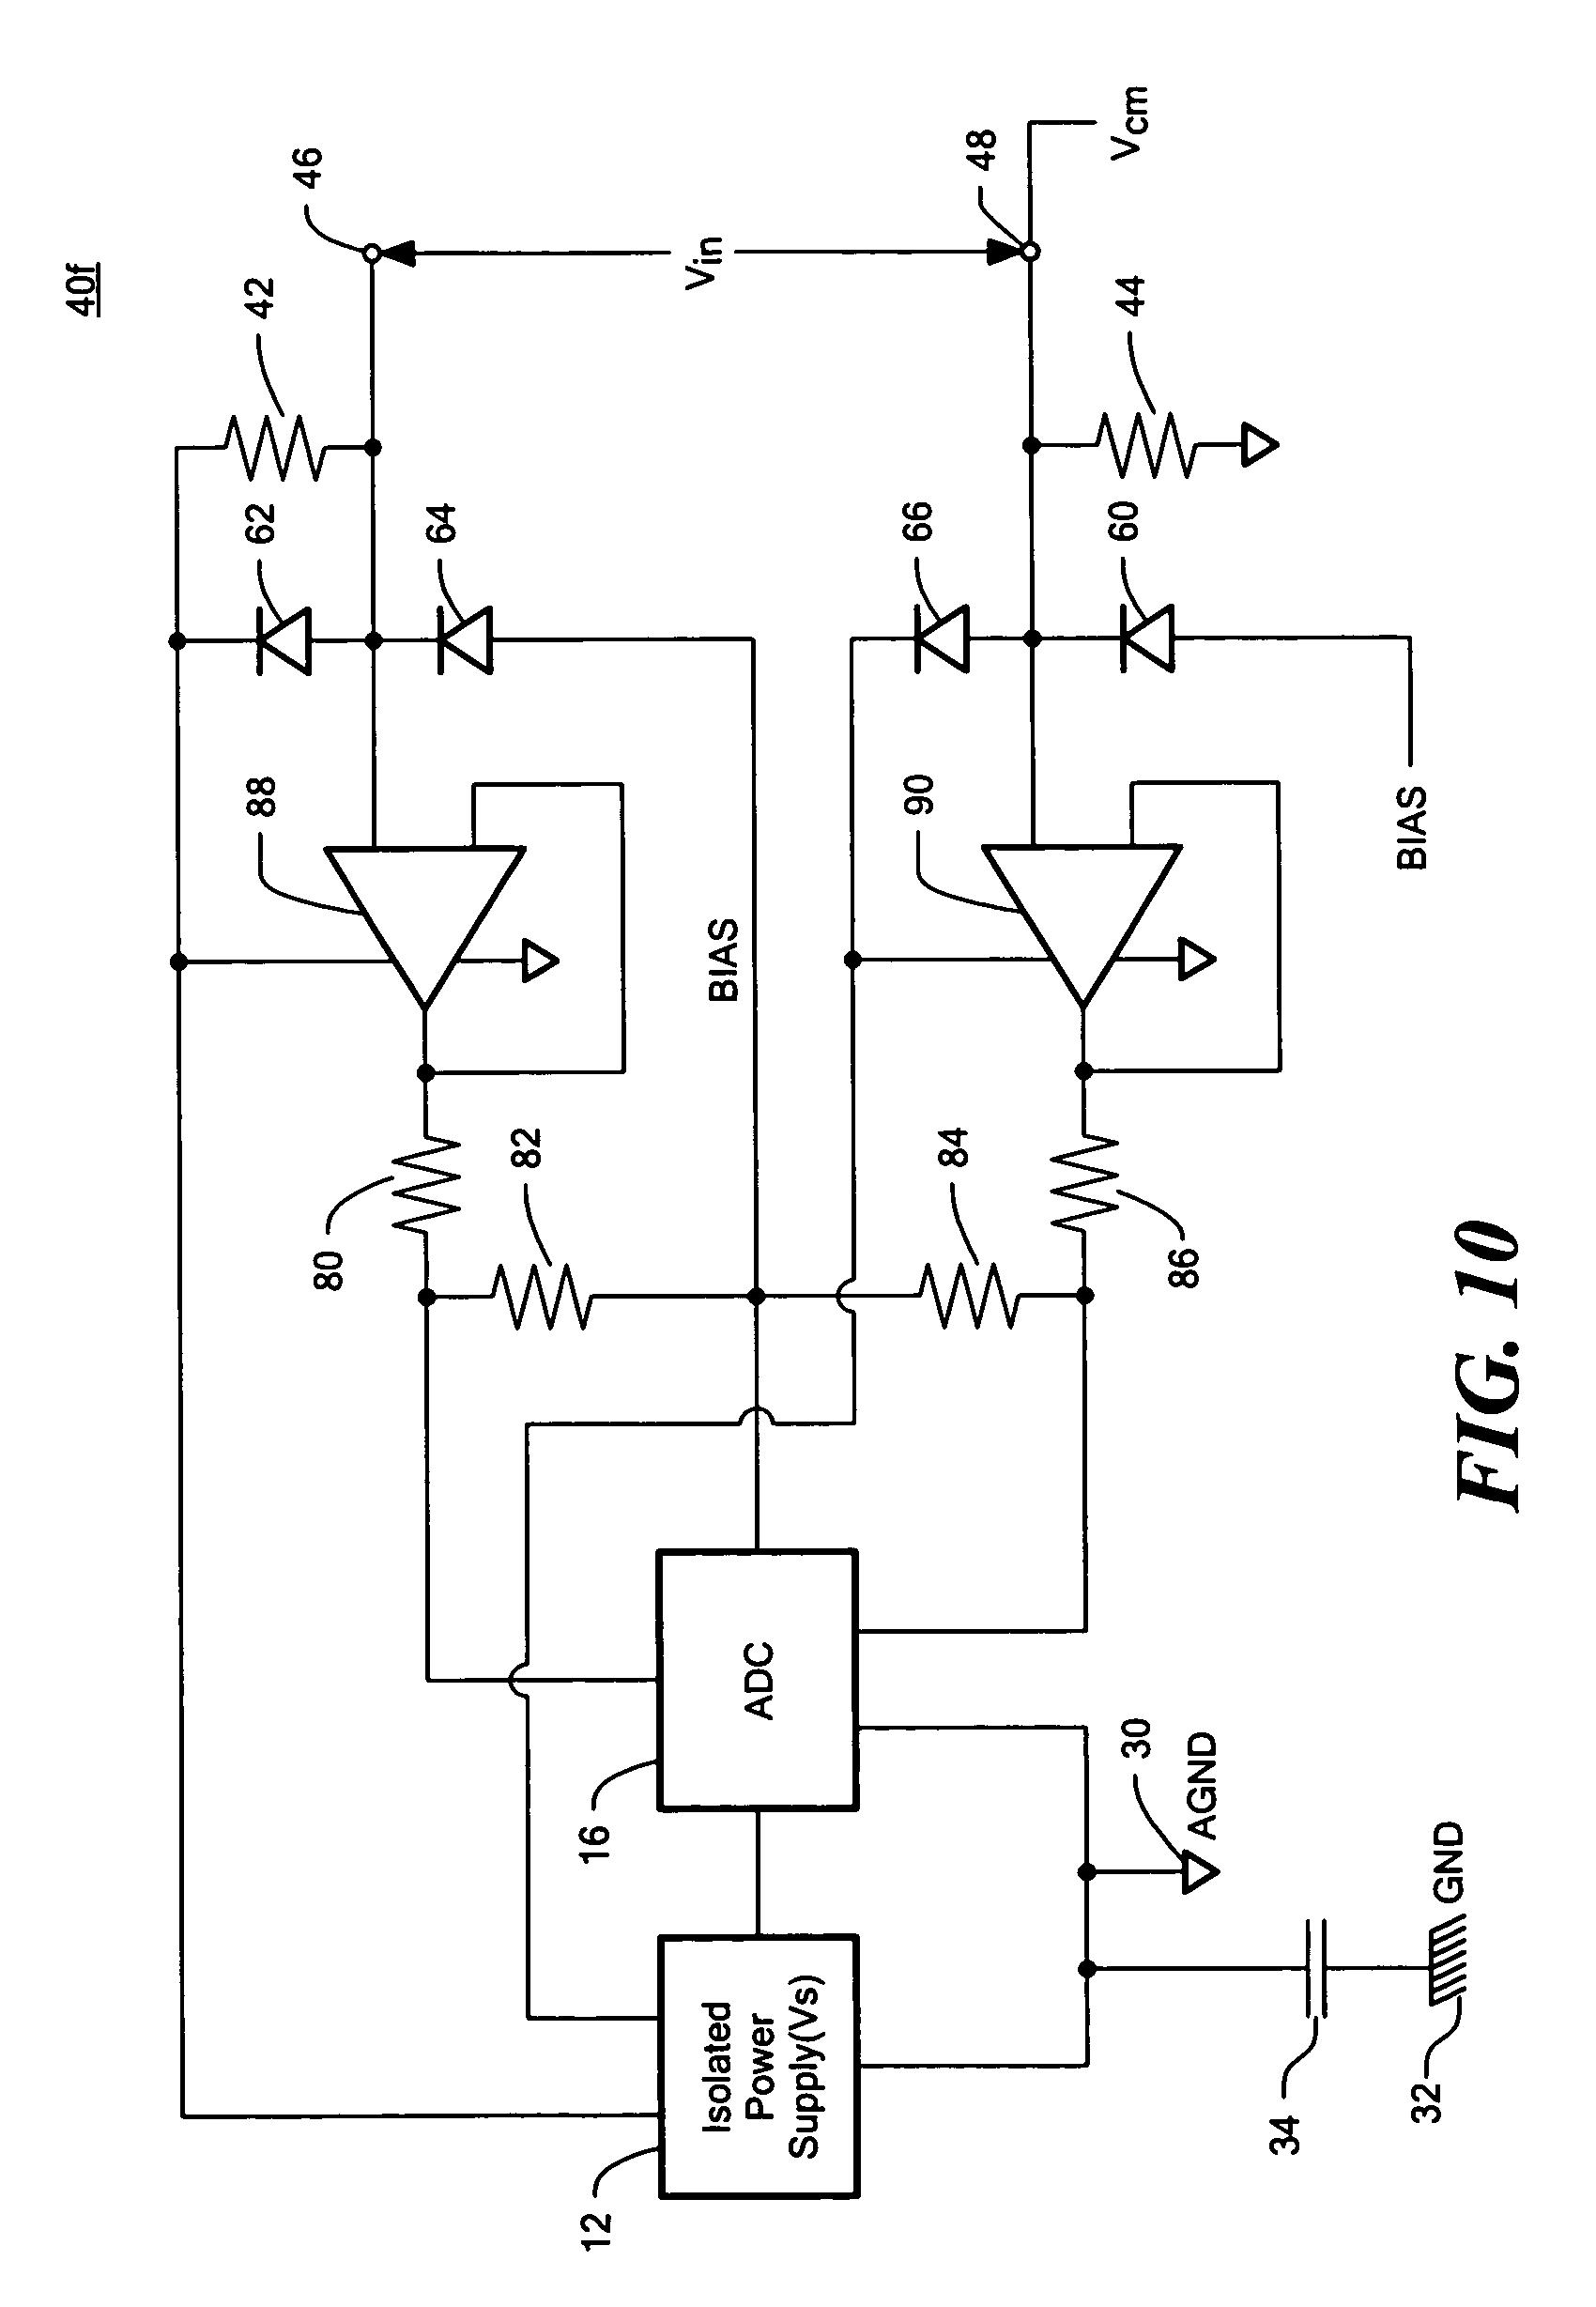 Ib16 Wiring Diagram